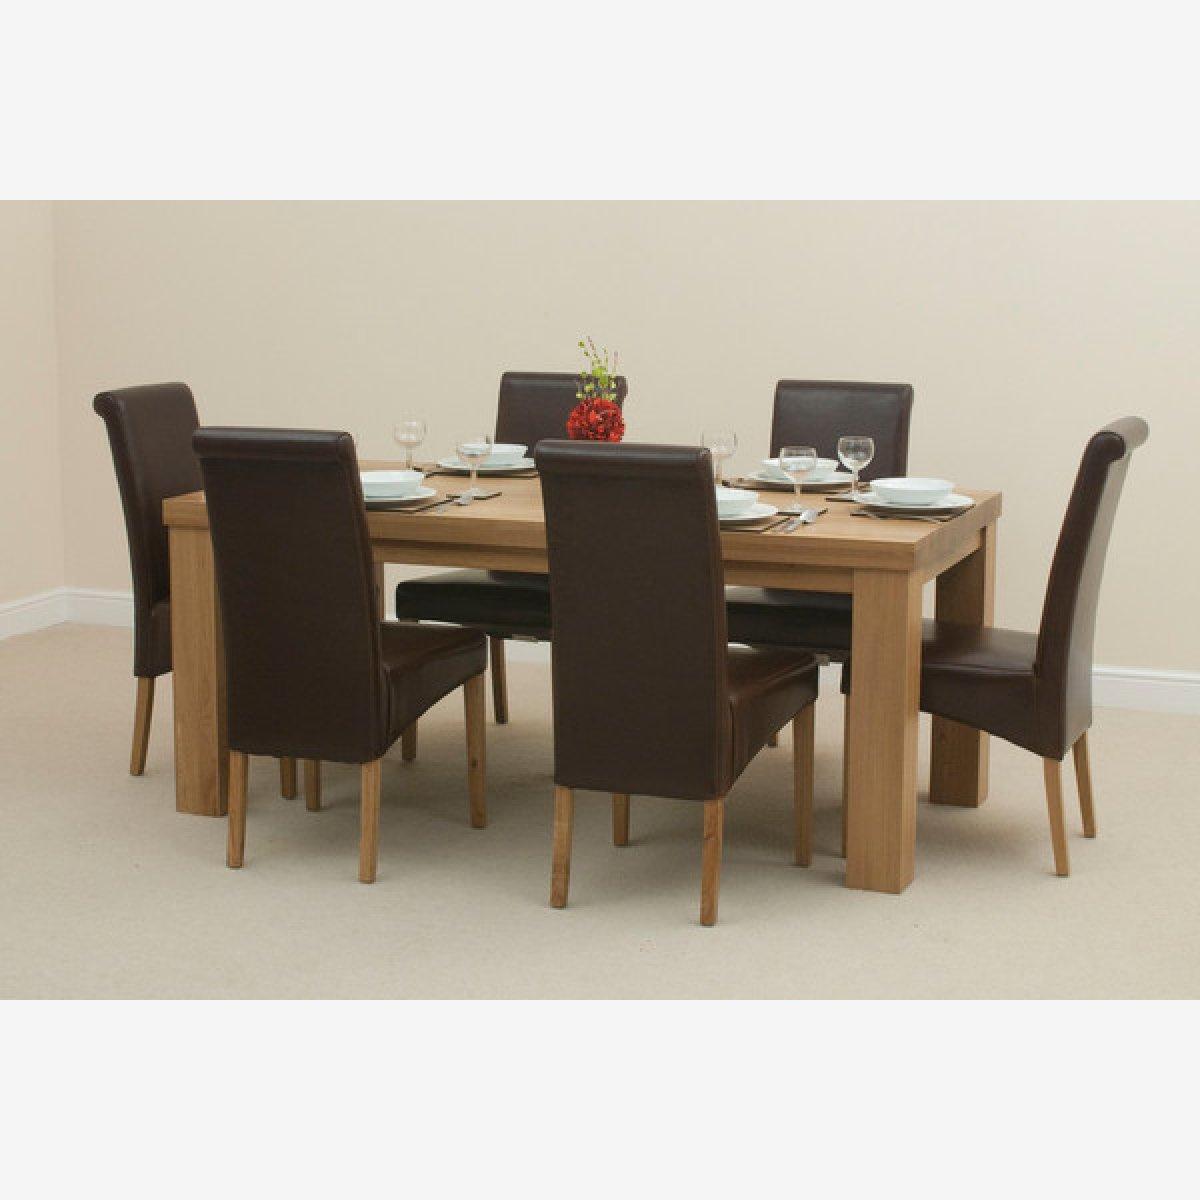 6ft Solid Oak Dining Table Alto Natural Solid Oak 6ft x 3ft